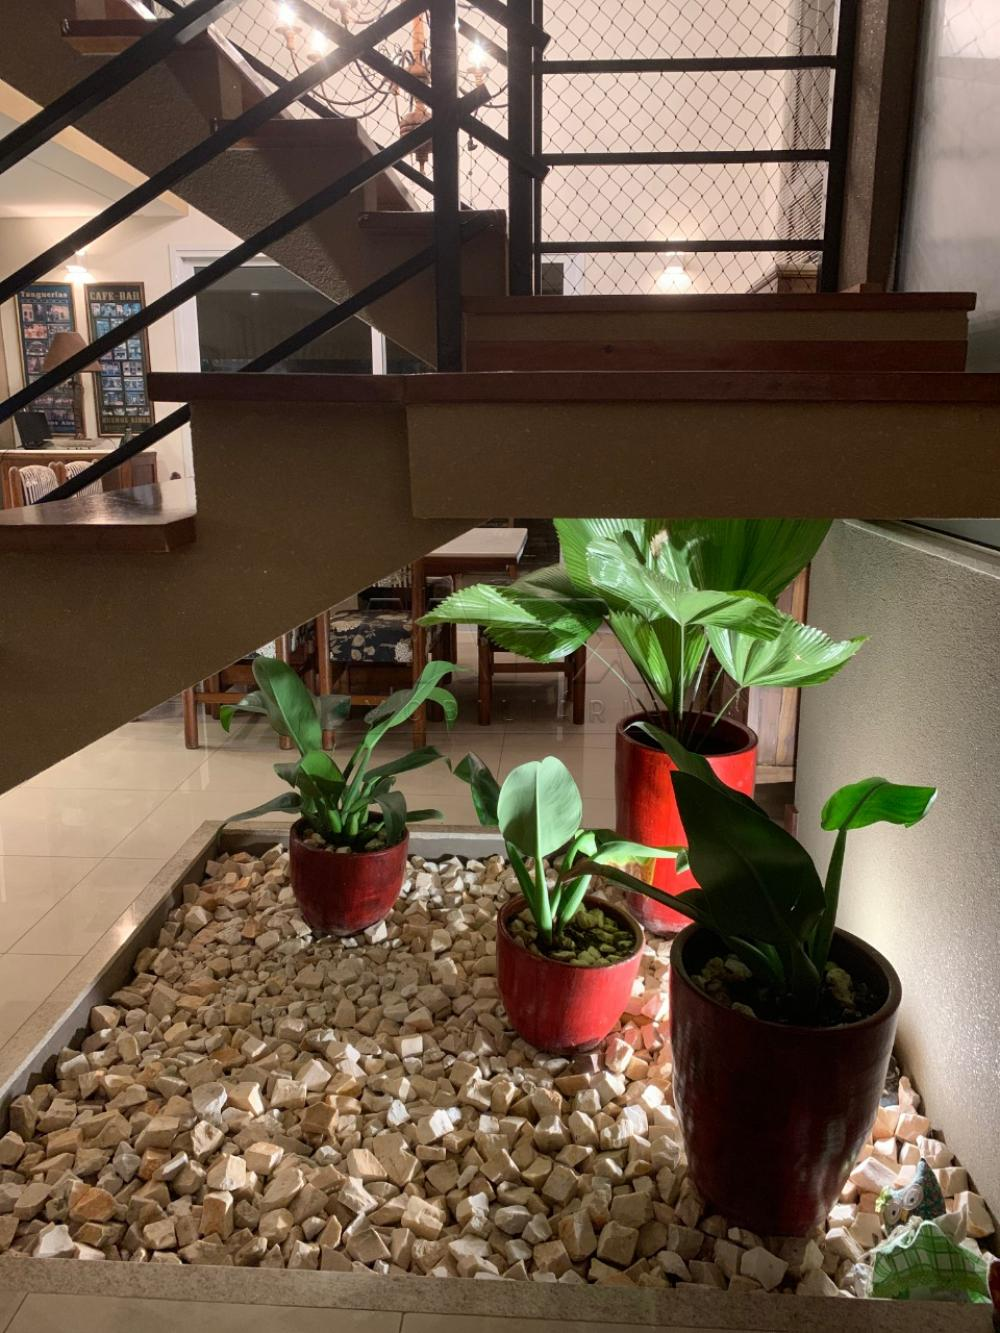 Comprar Casa / Condomínio em Bauru apenas R$ 1.500.000,00 - Foto 12